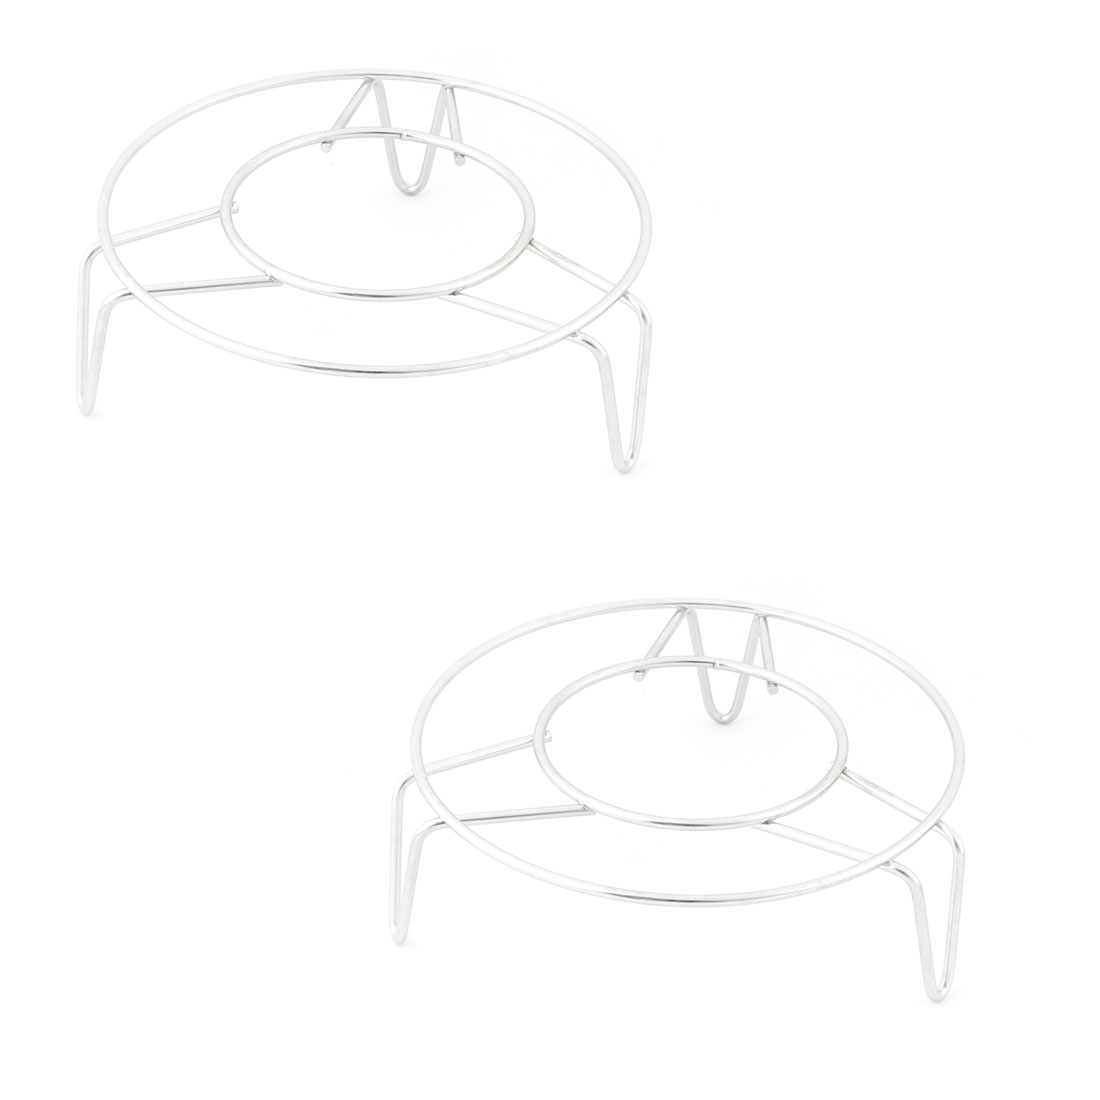 Stainless Steel Round Shape 3 Legs Design Steam Rack 12.5cm x 4cm 2 Pcs